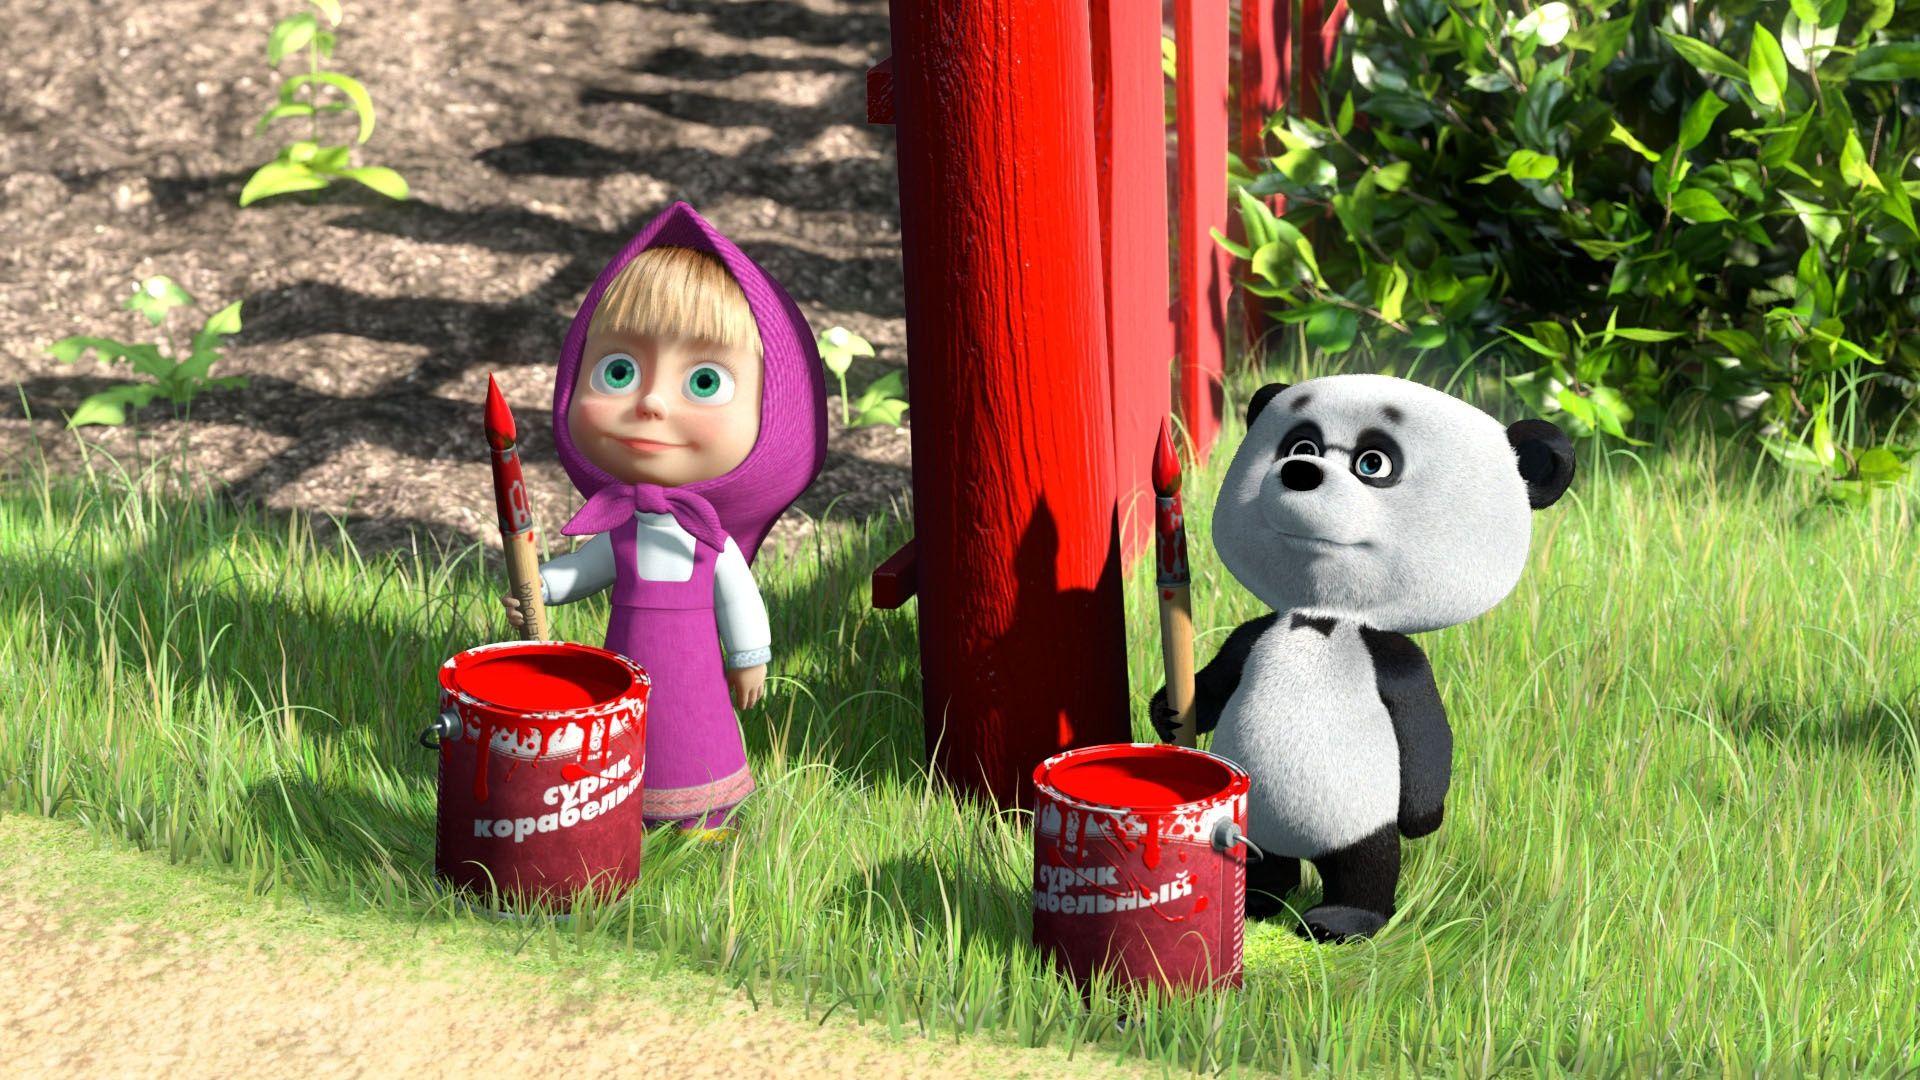 Little Cousin Masha And The Bear Pinterest Masha And The